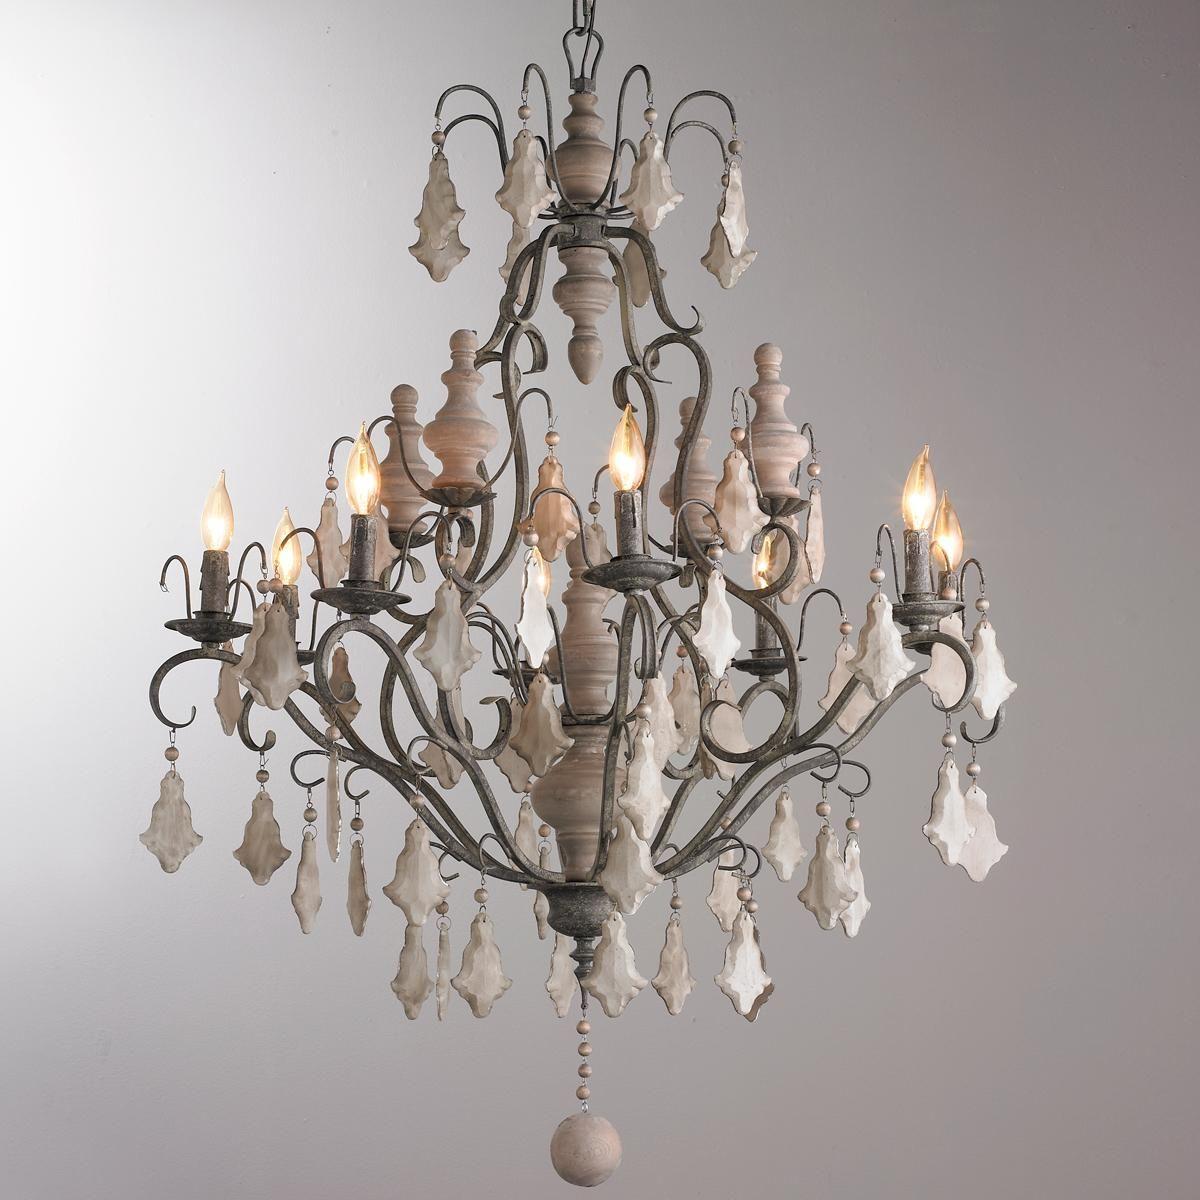 Painted crystal wood finial chandelier lighting chandelier